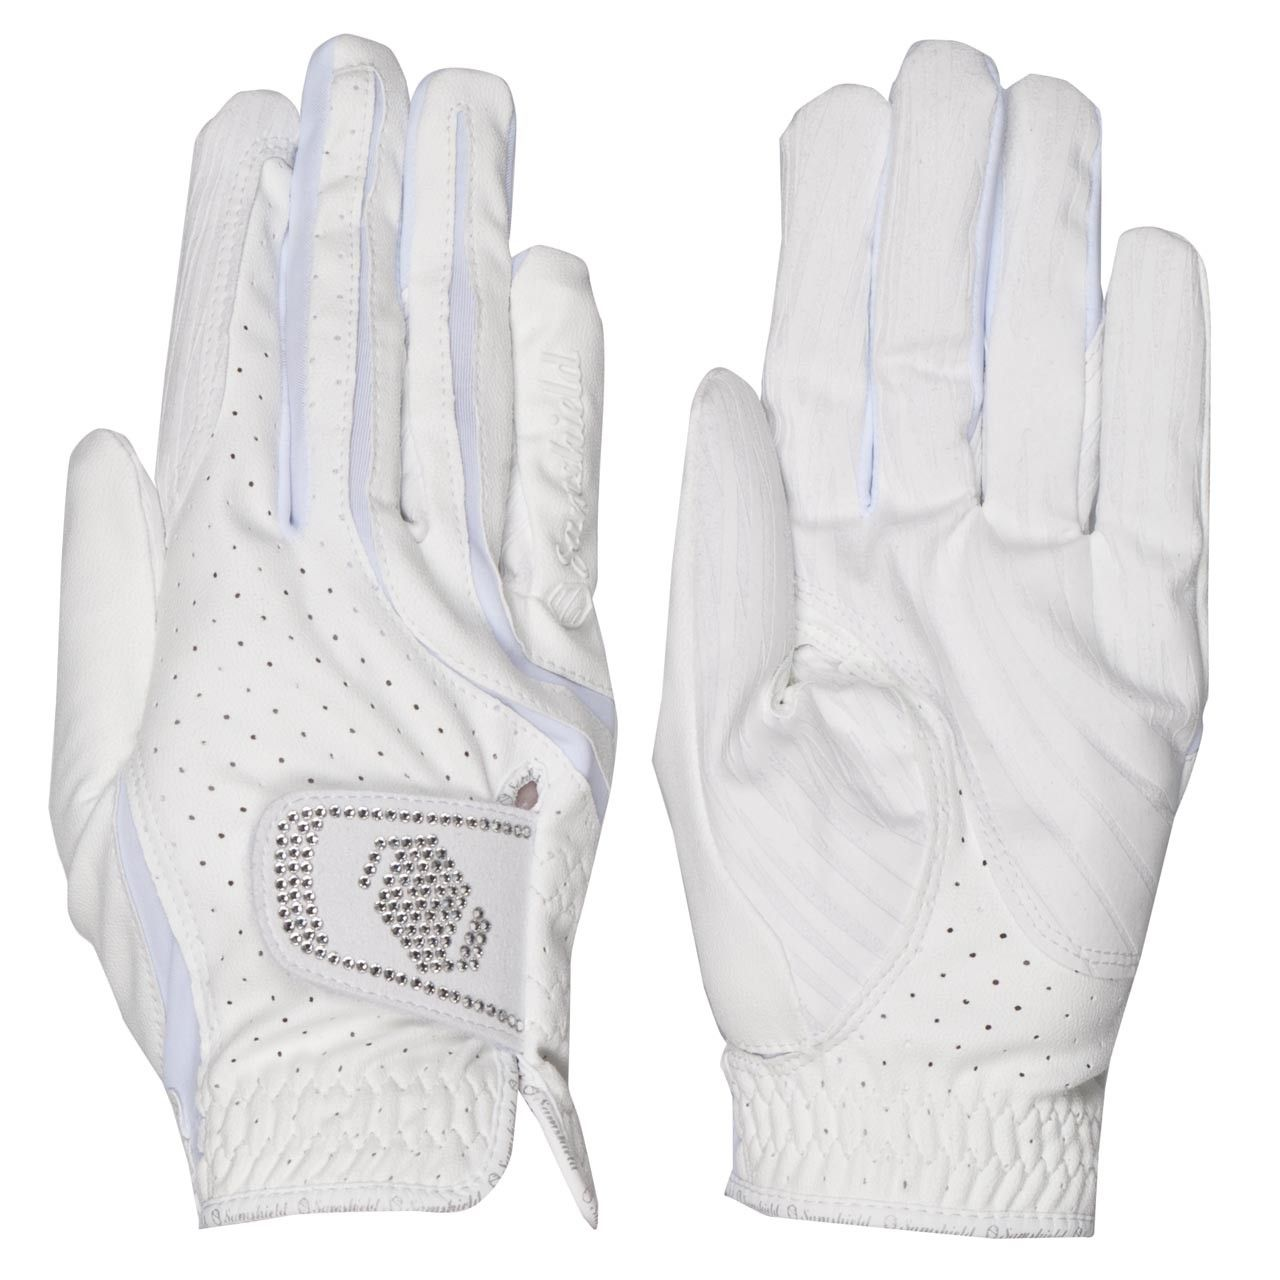 Samshield handschoenen Swarovski wit maat:7